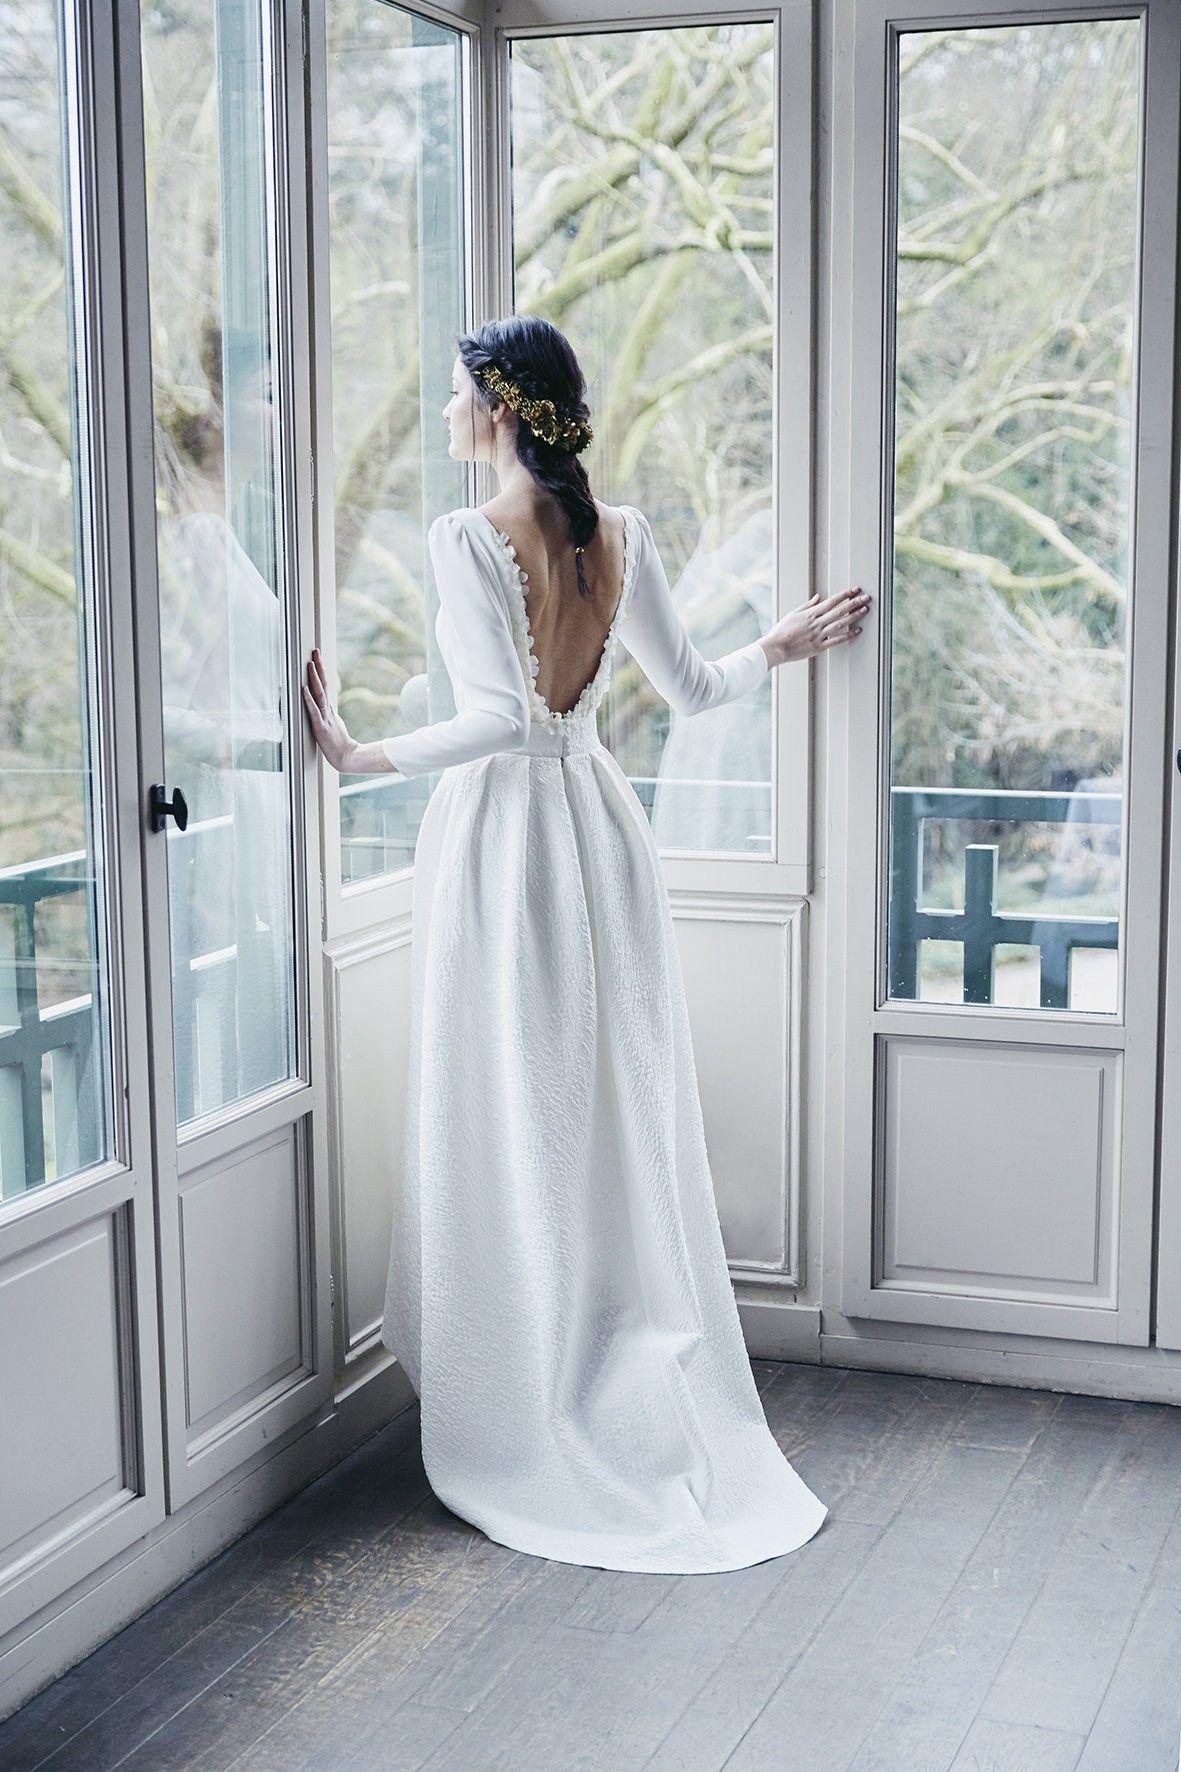 Pin de Katherine Arana en dresses | Pinterest | Vestidos de novia ...